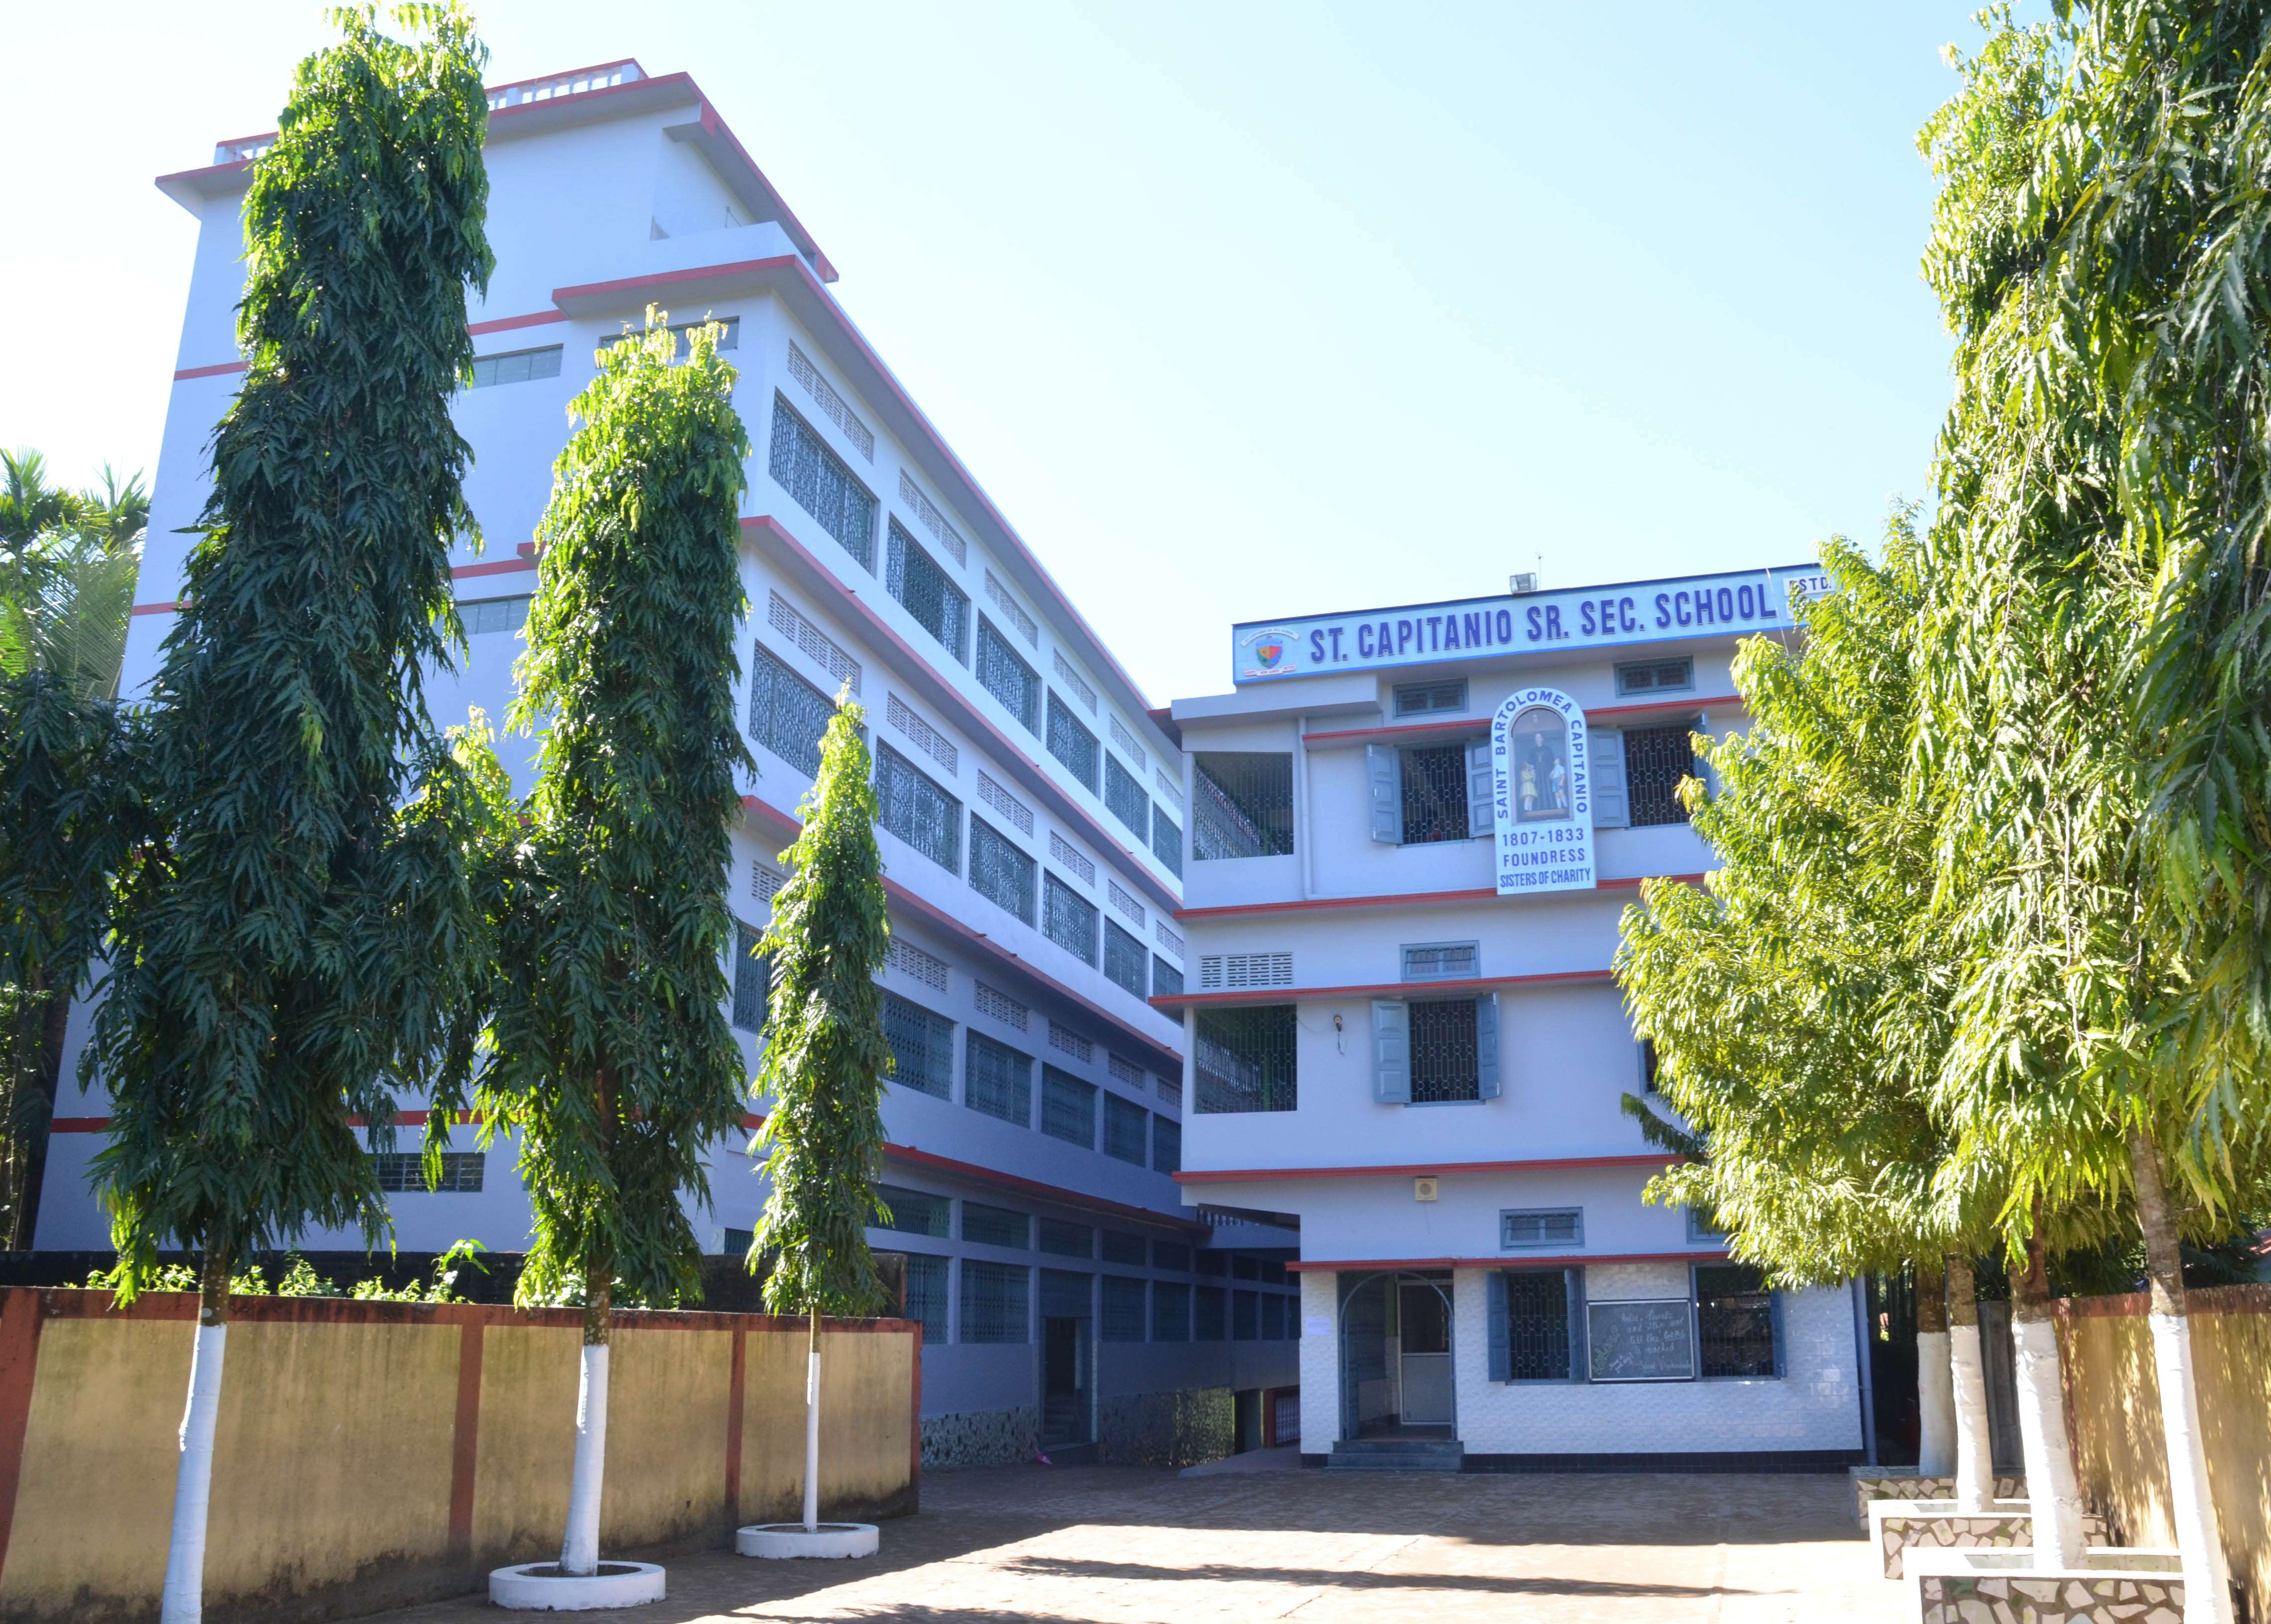 SAINT CAPITANIO SCHOOL KUARPAR PO REGIONAL ENGINEERING COLLEGE DISTT COCHAR SILCHAR 230080